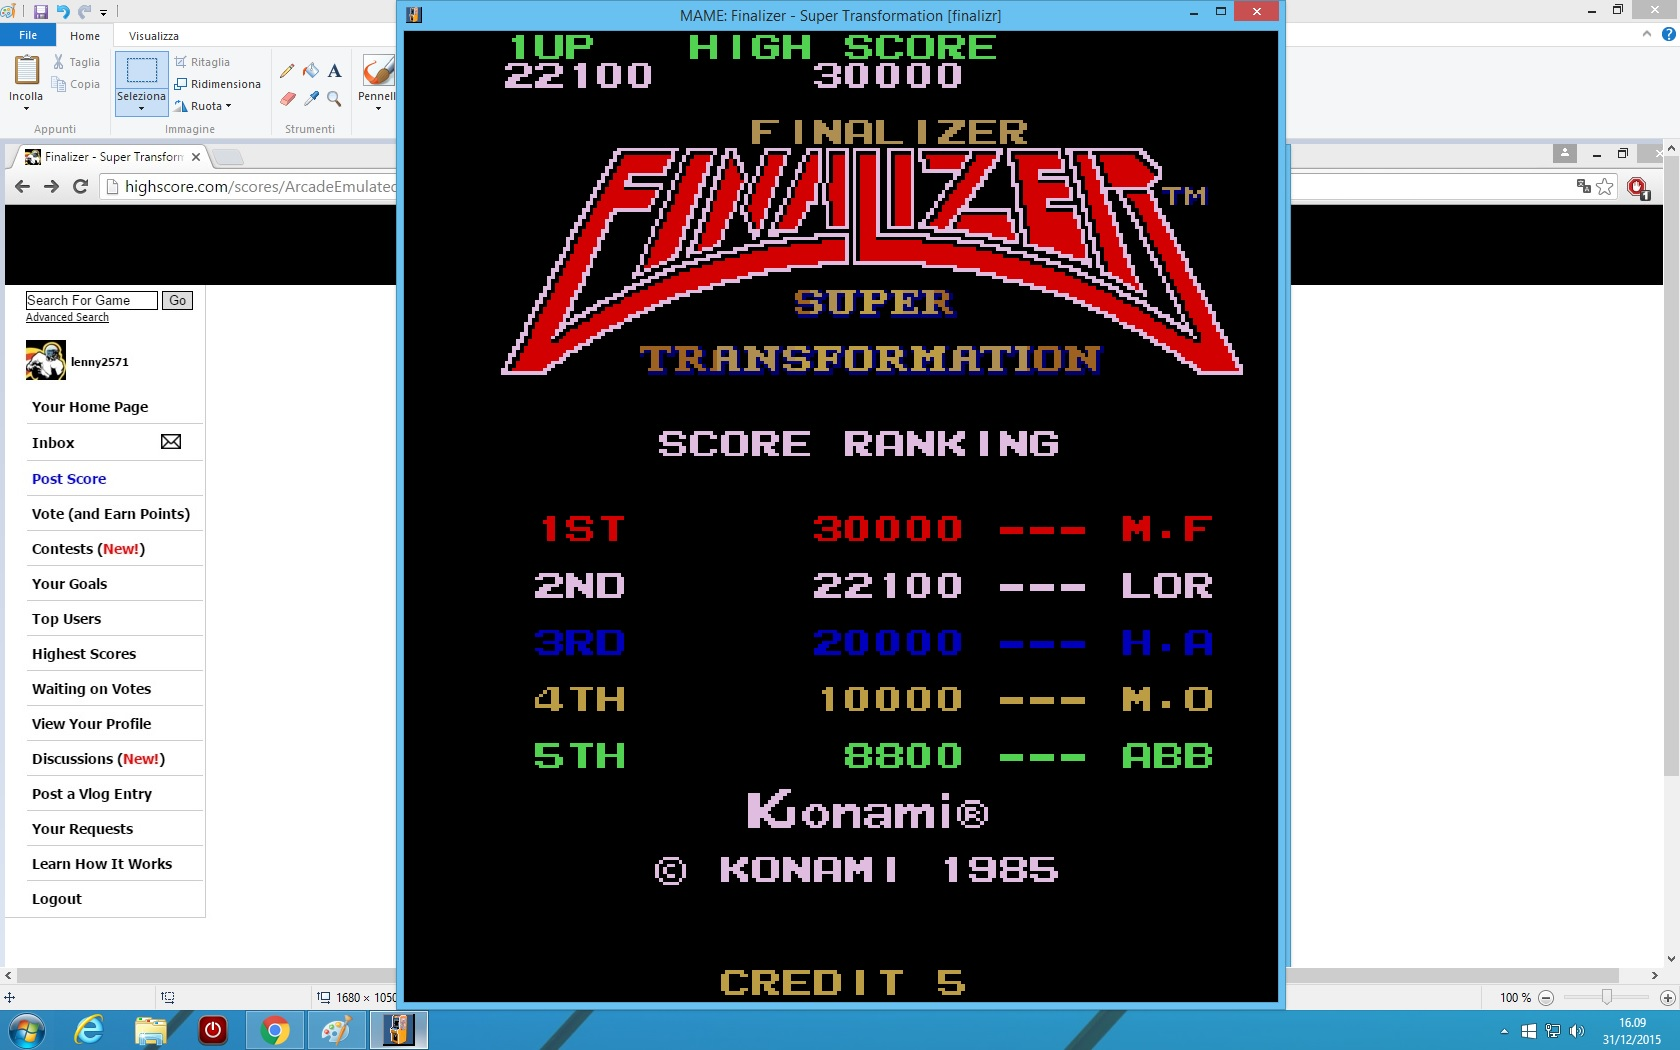 Finalizer - Super Transformation [finalizr] 22,100 points